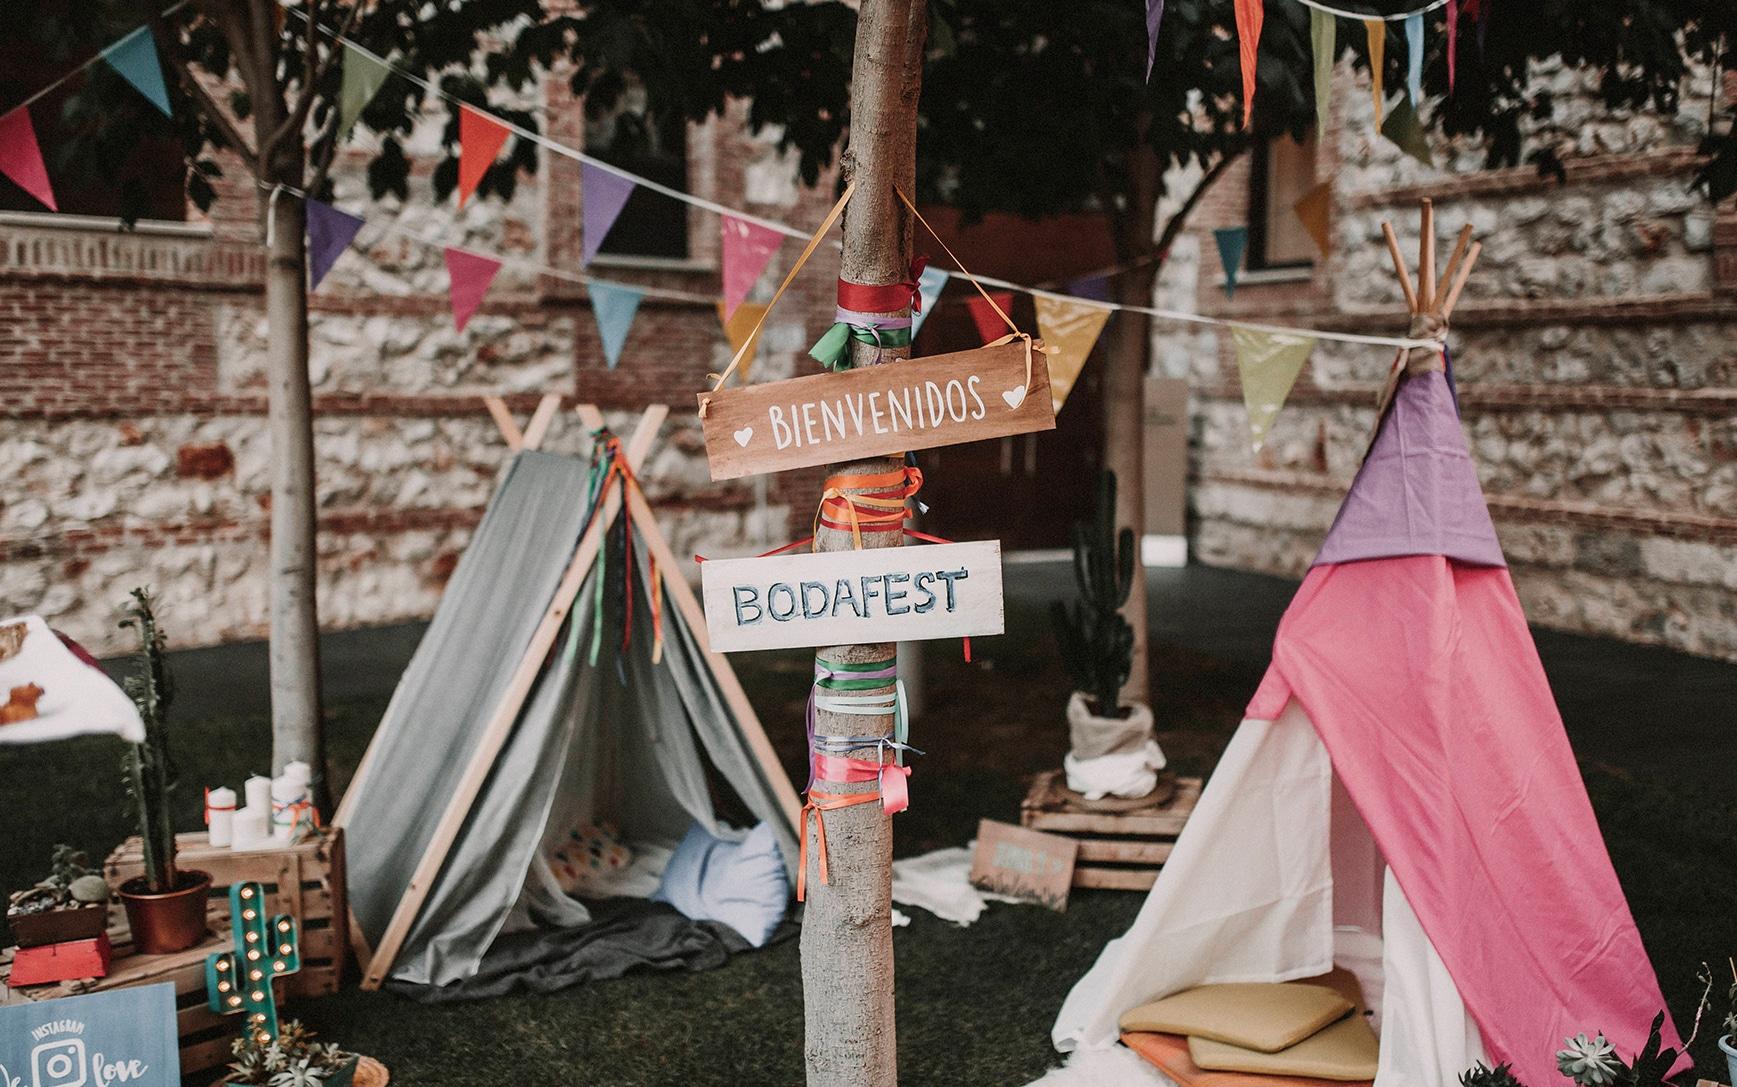 rincón BodaFest Ana y Juanma foto ernesto villalba